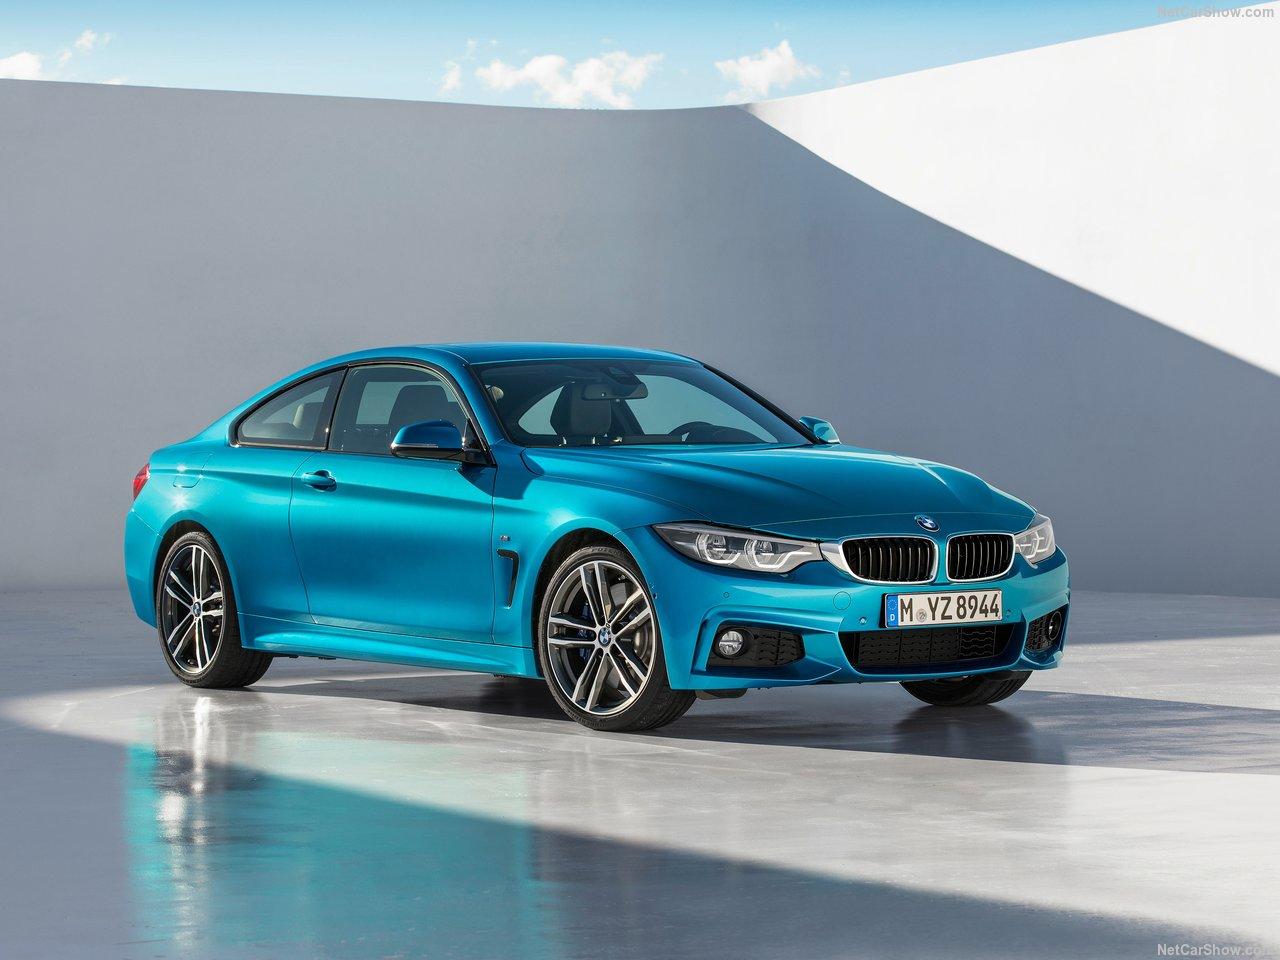 2017 Bmw 6 Series >> 2018 BMW 4-Series Coupe Design, Price, Specs, Engine